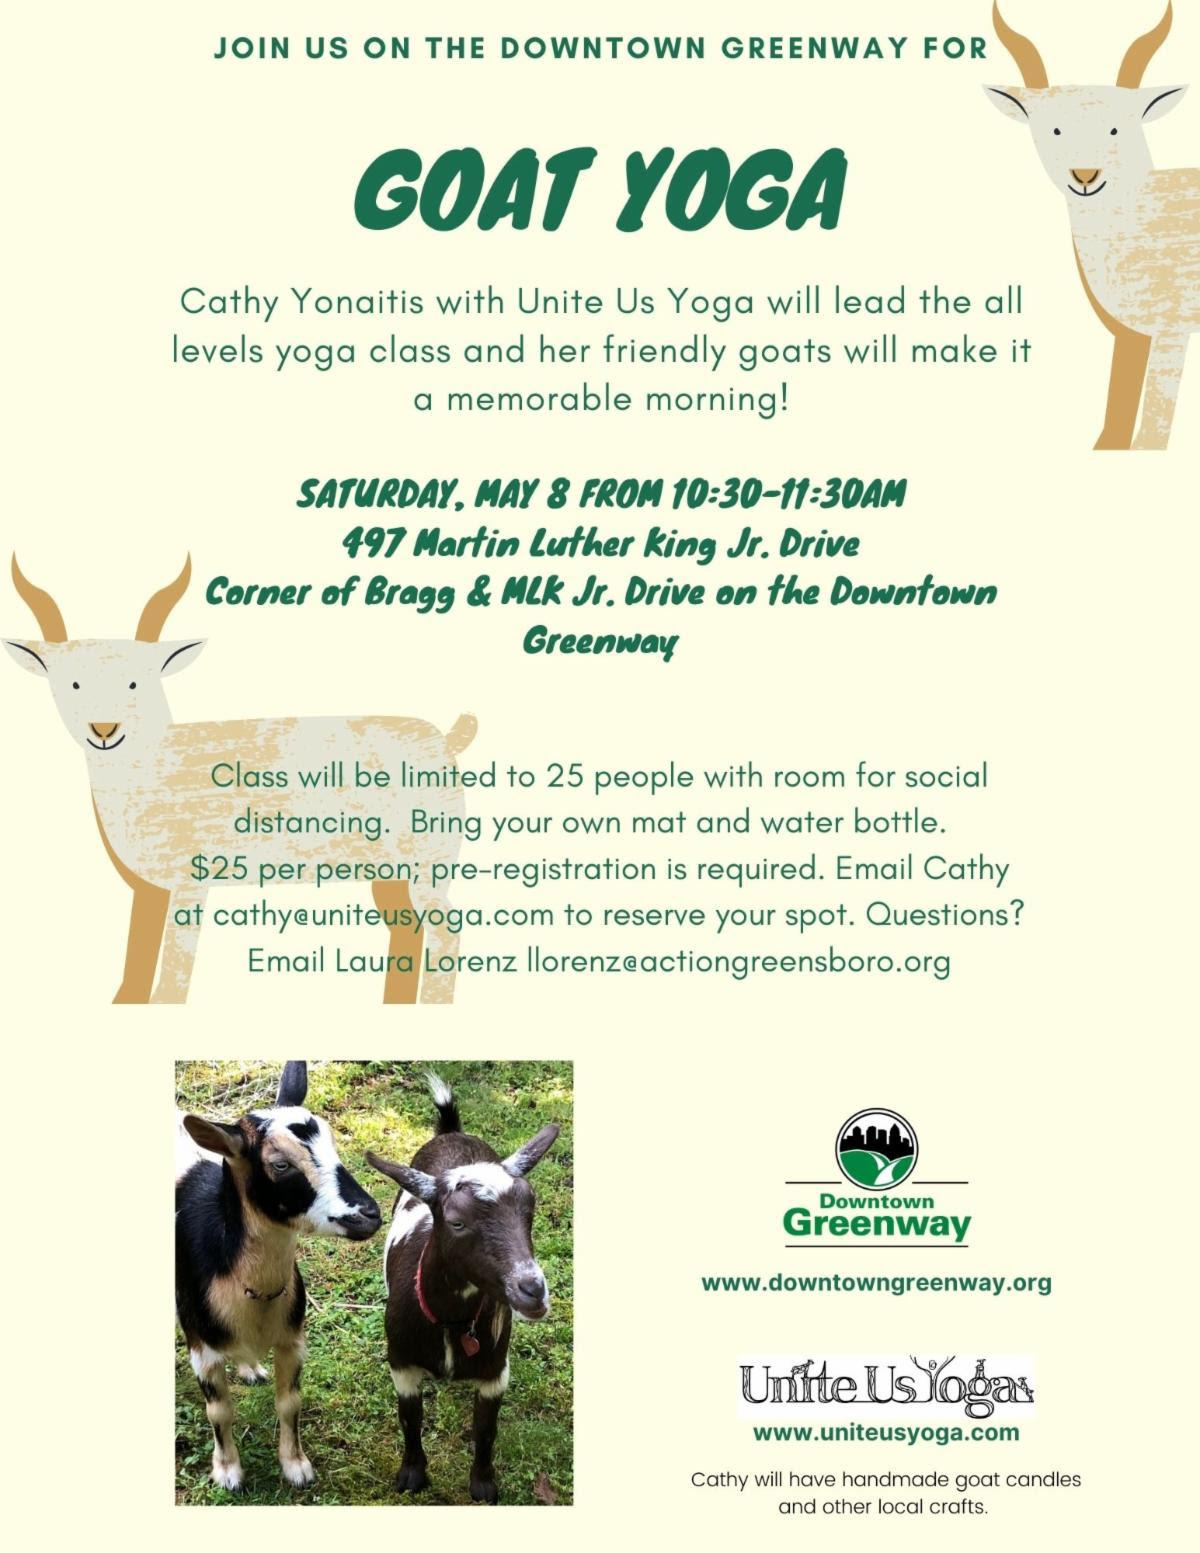 details on goat yoga class